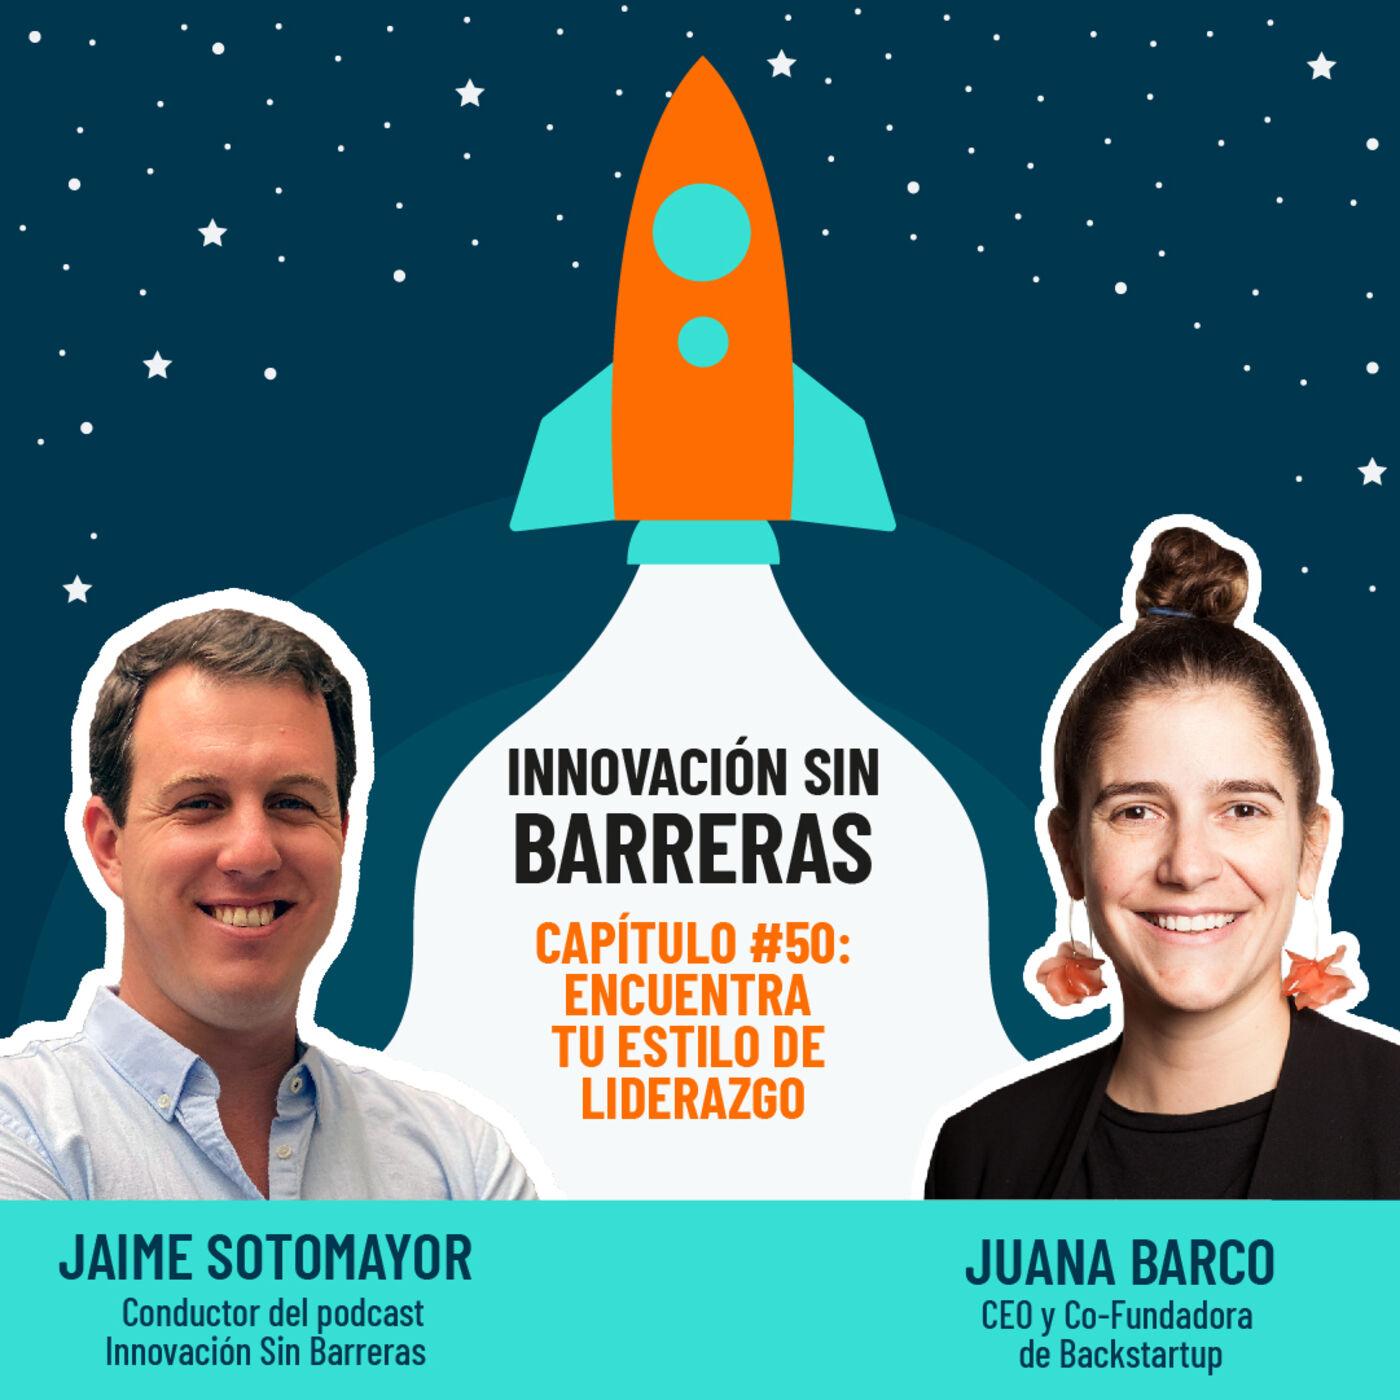 #050. Juana Barco — Encuentra tu estilo de liderazgo